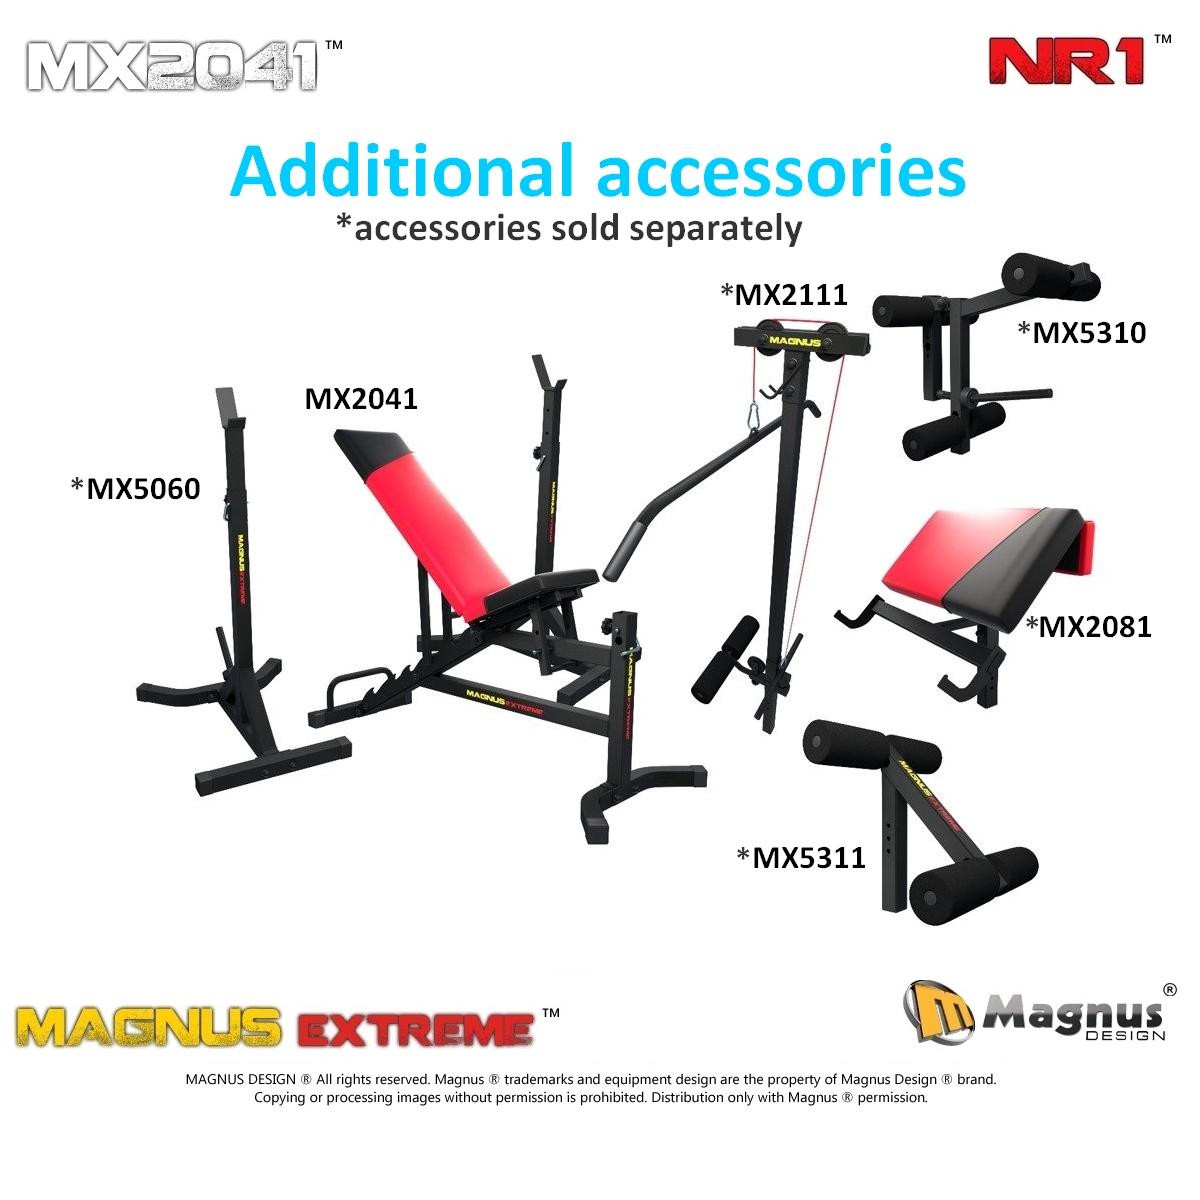 Proper design of the Magnus exercise bench